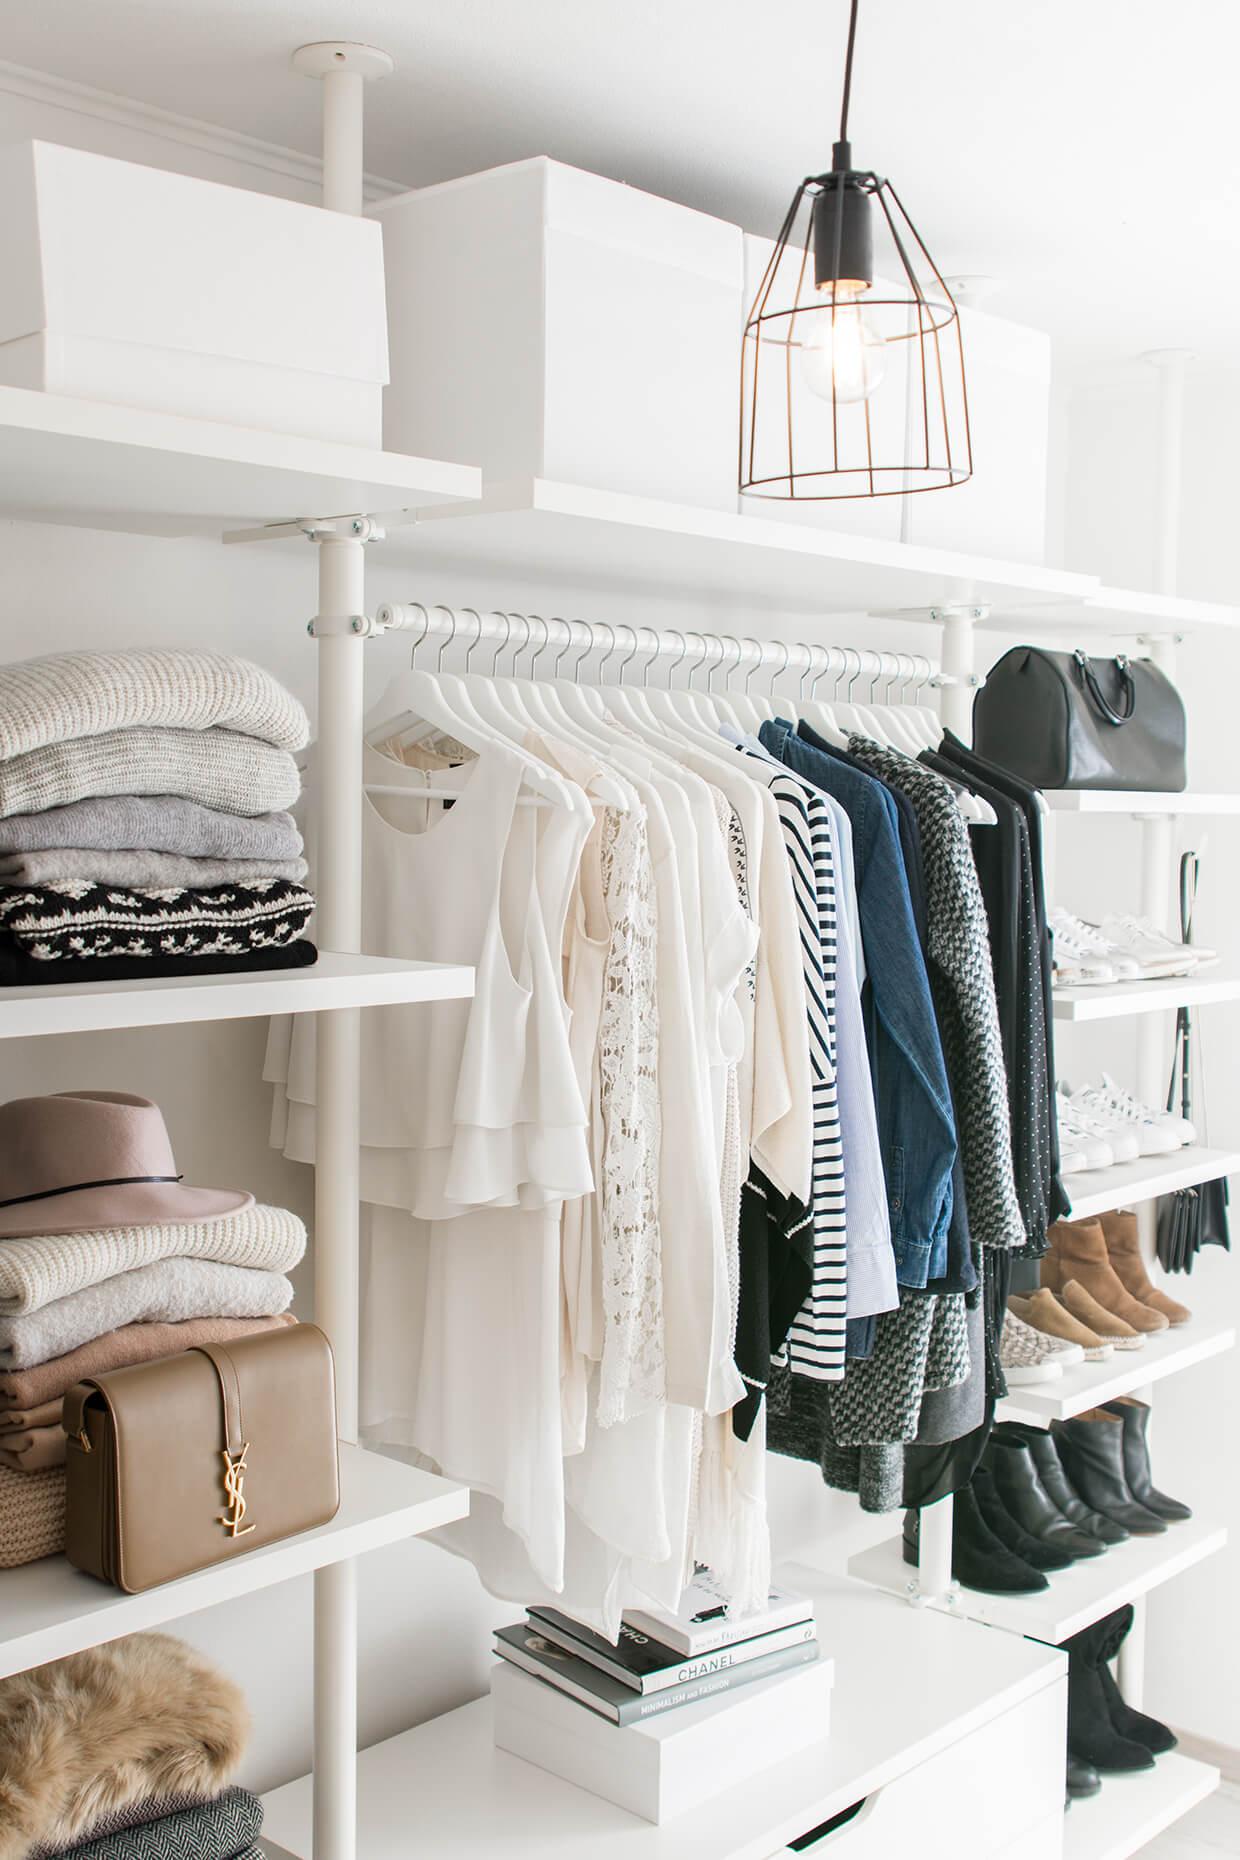 Empty that Wardrobe - Simplify Your Life